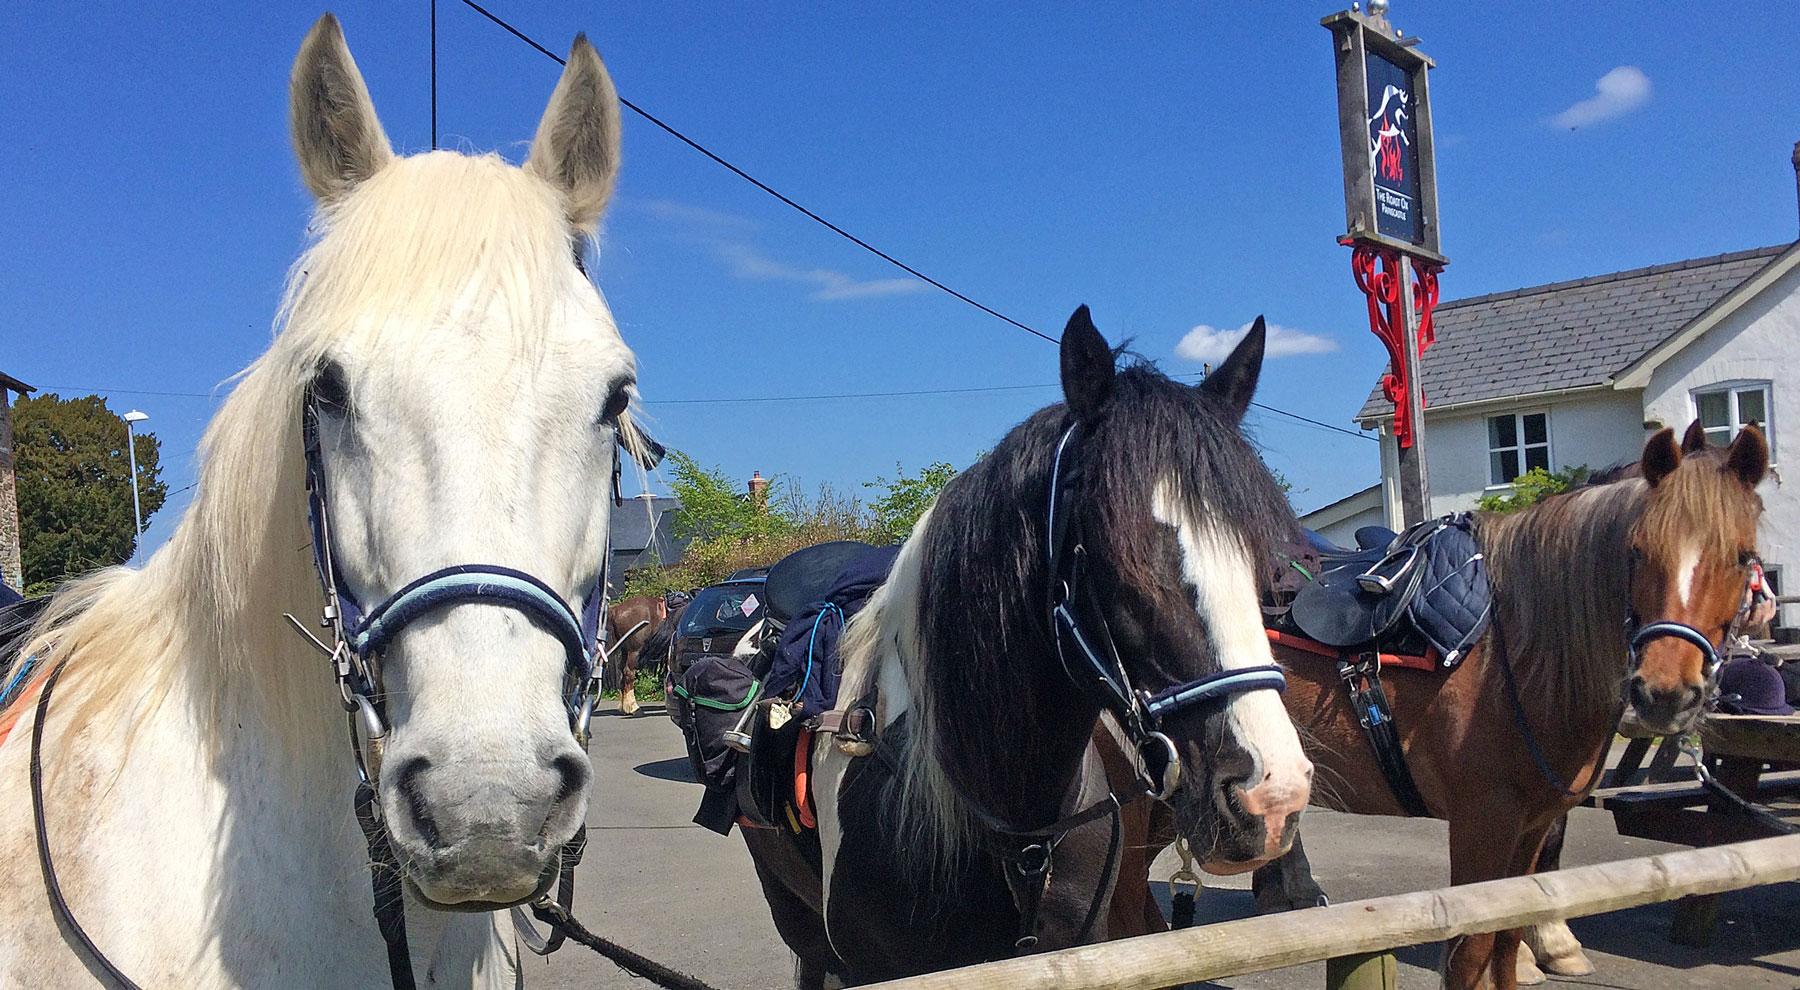 Horses tied up outside a pub